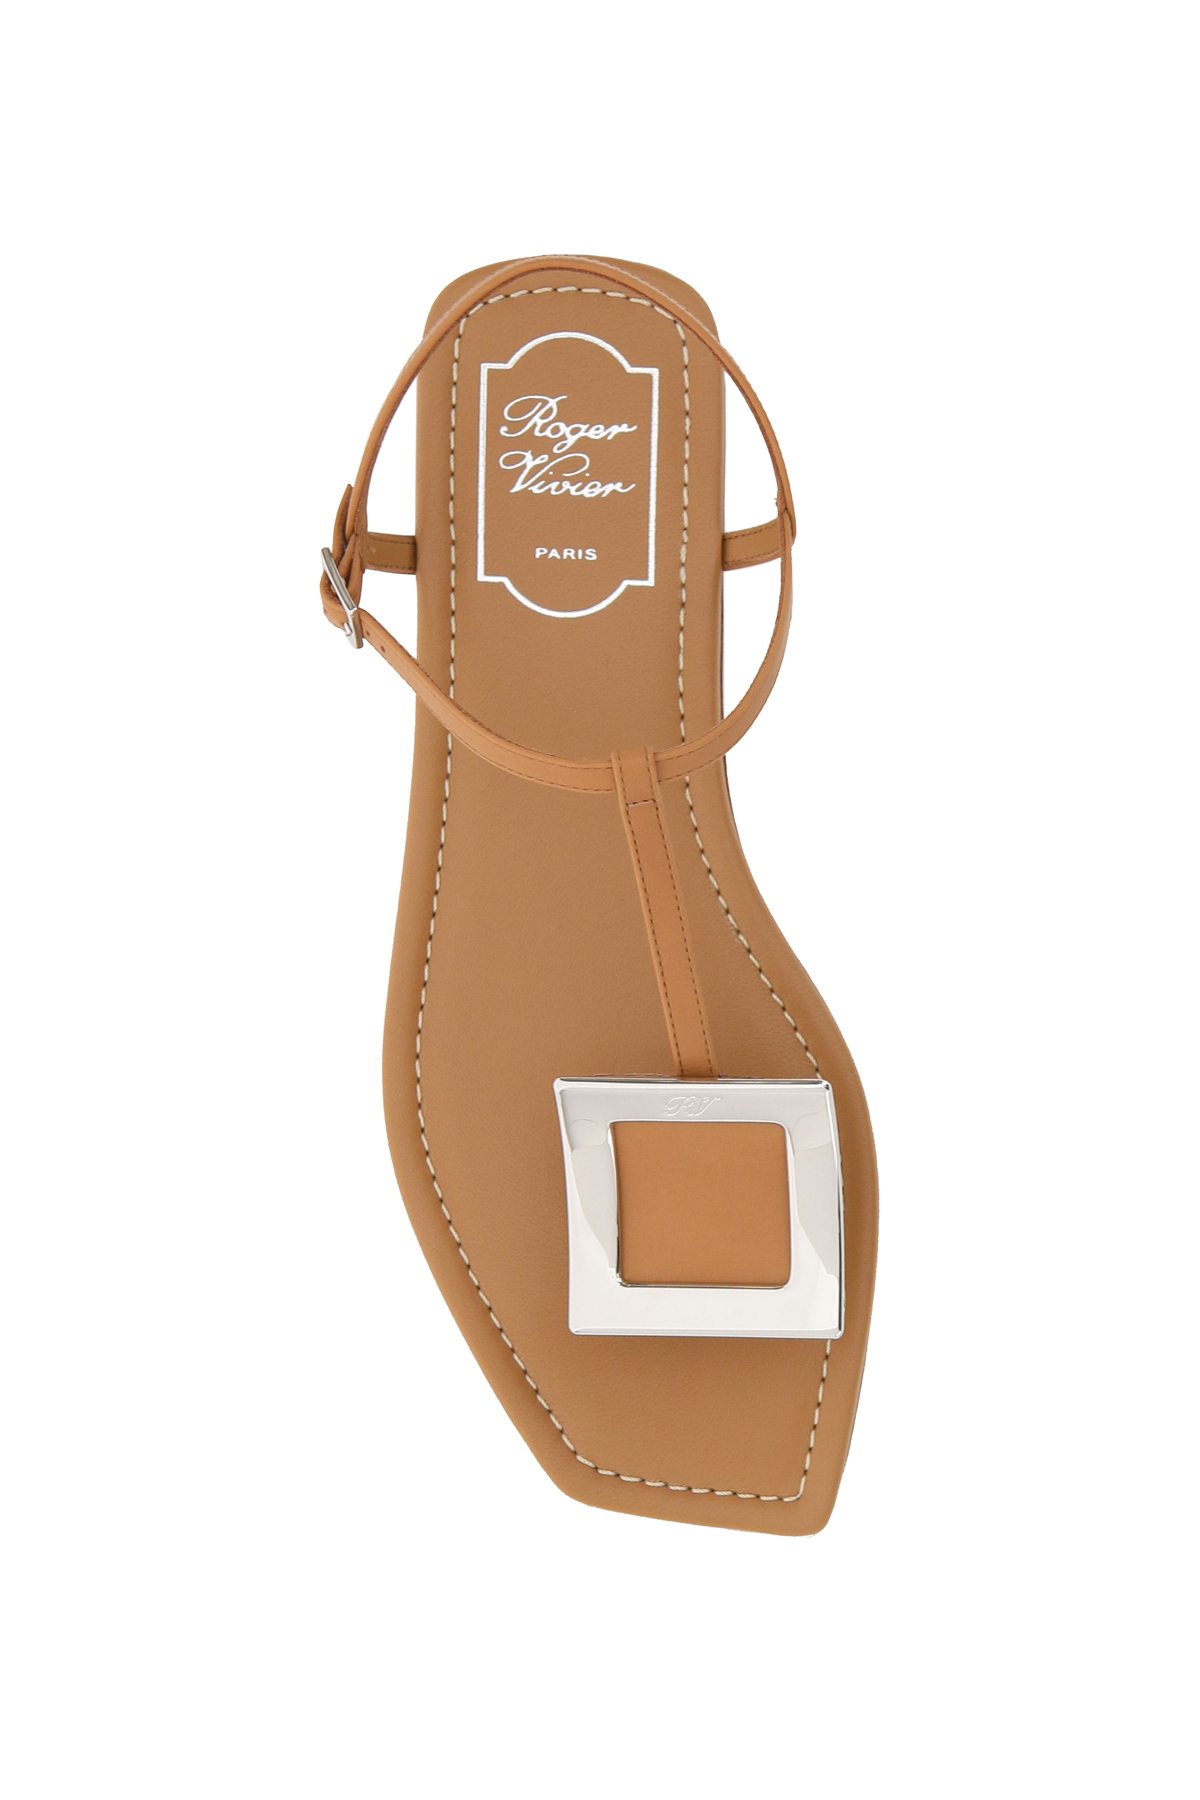 Roger vivier sandali  bikiviv thong